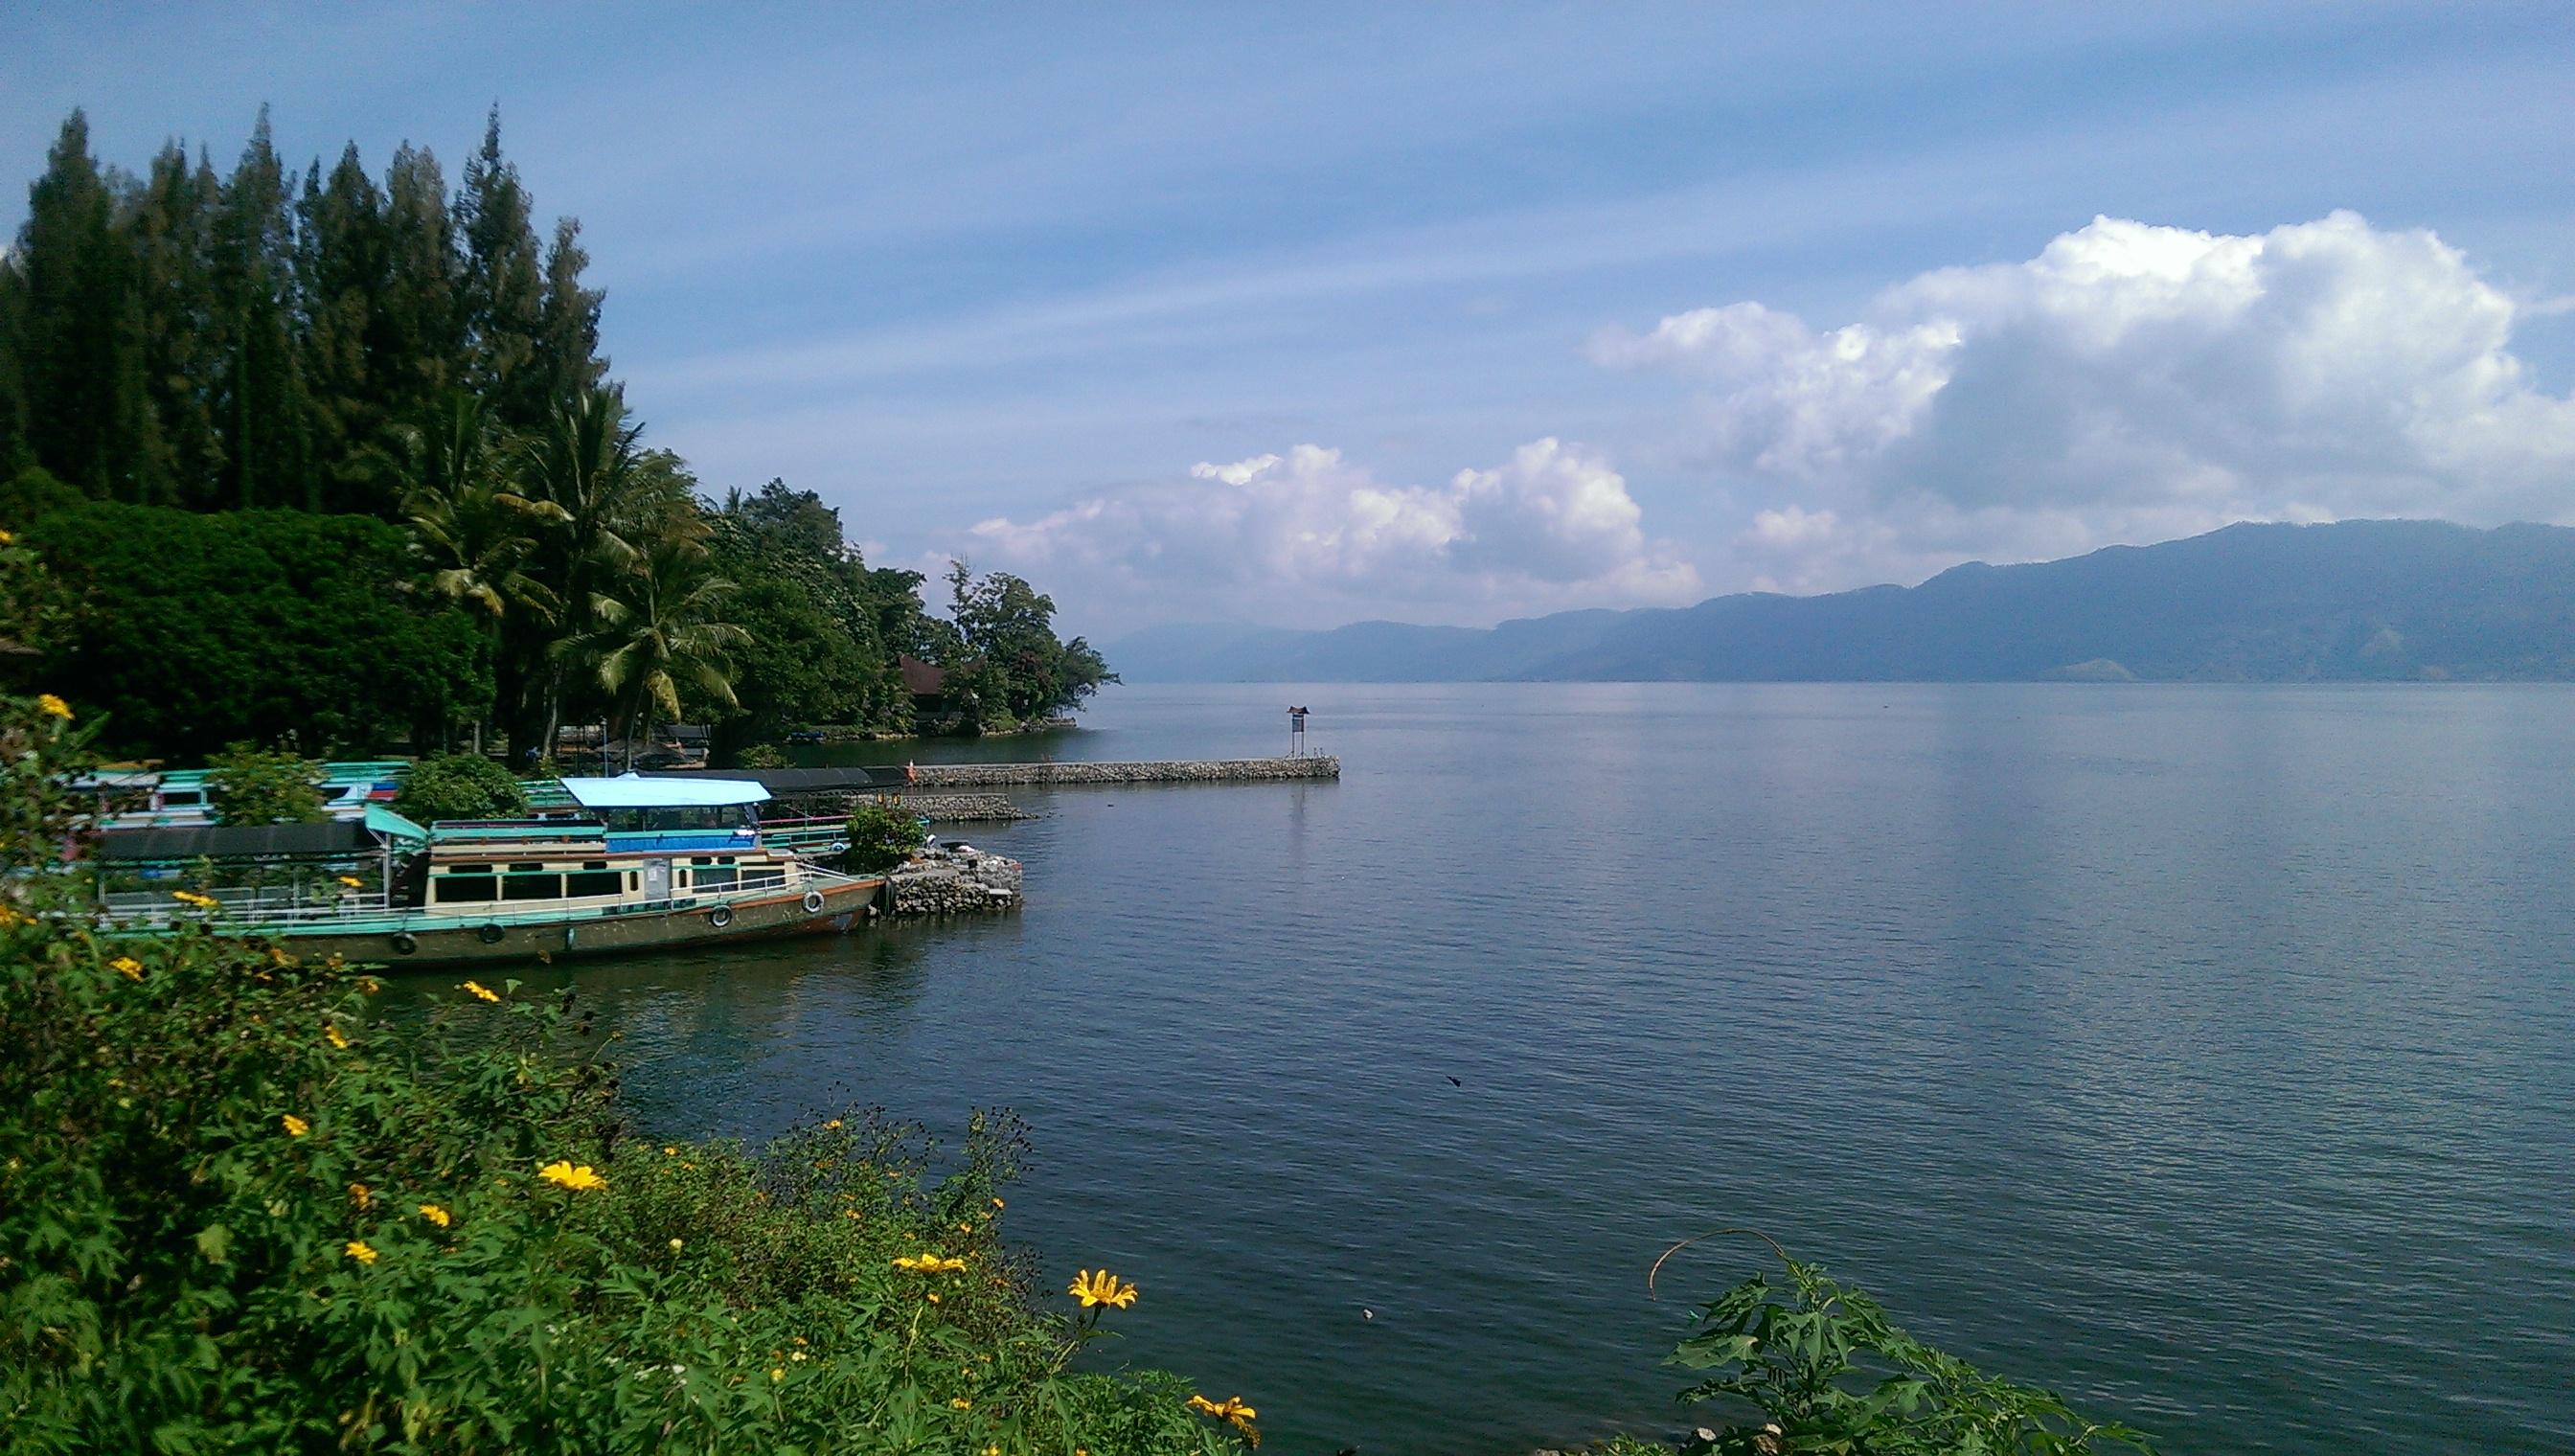 Lake Danau Toba Sumatra Indonesia solo female travel